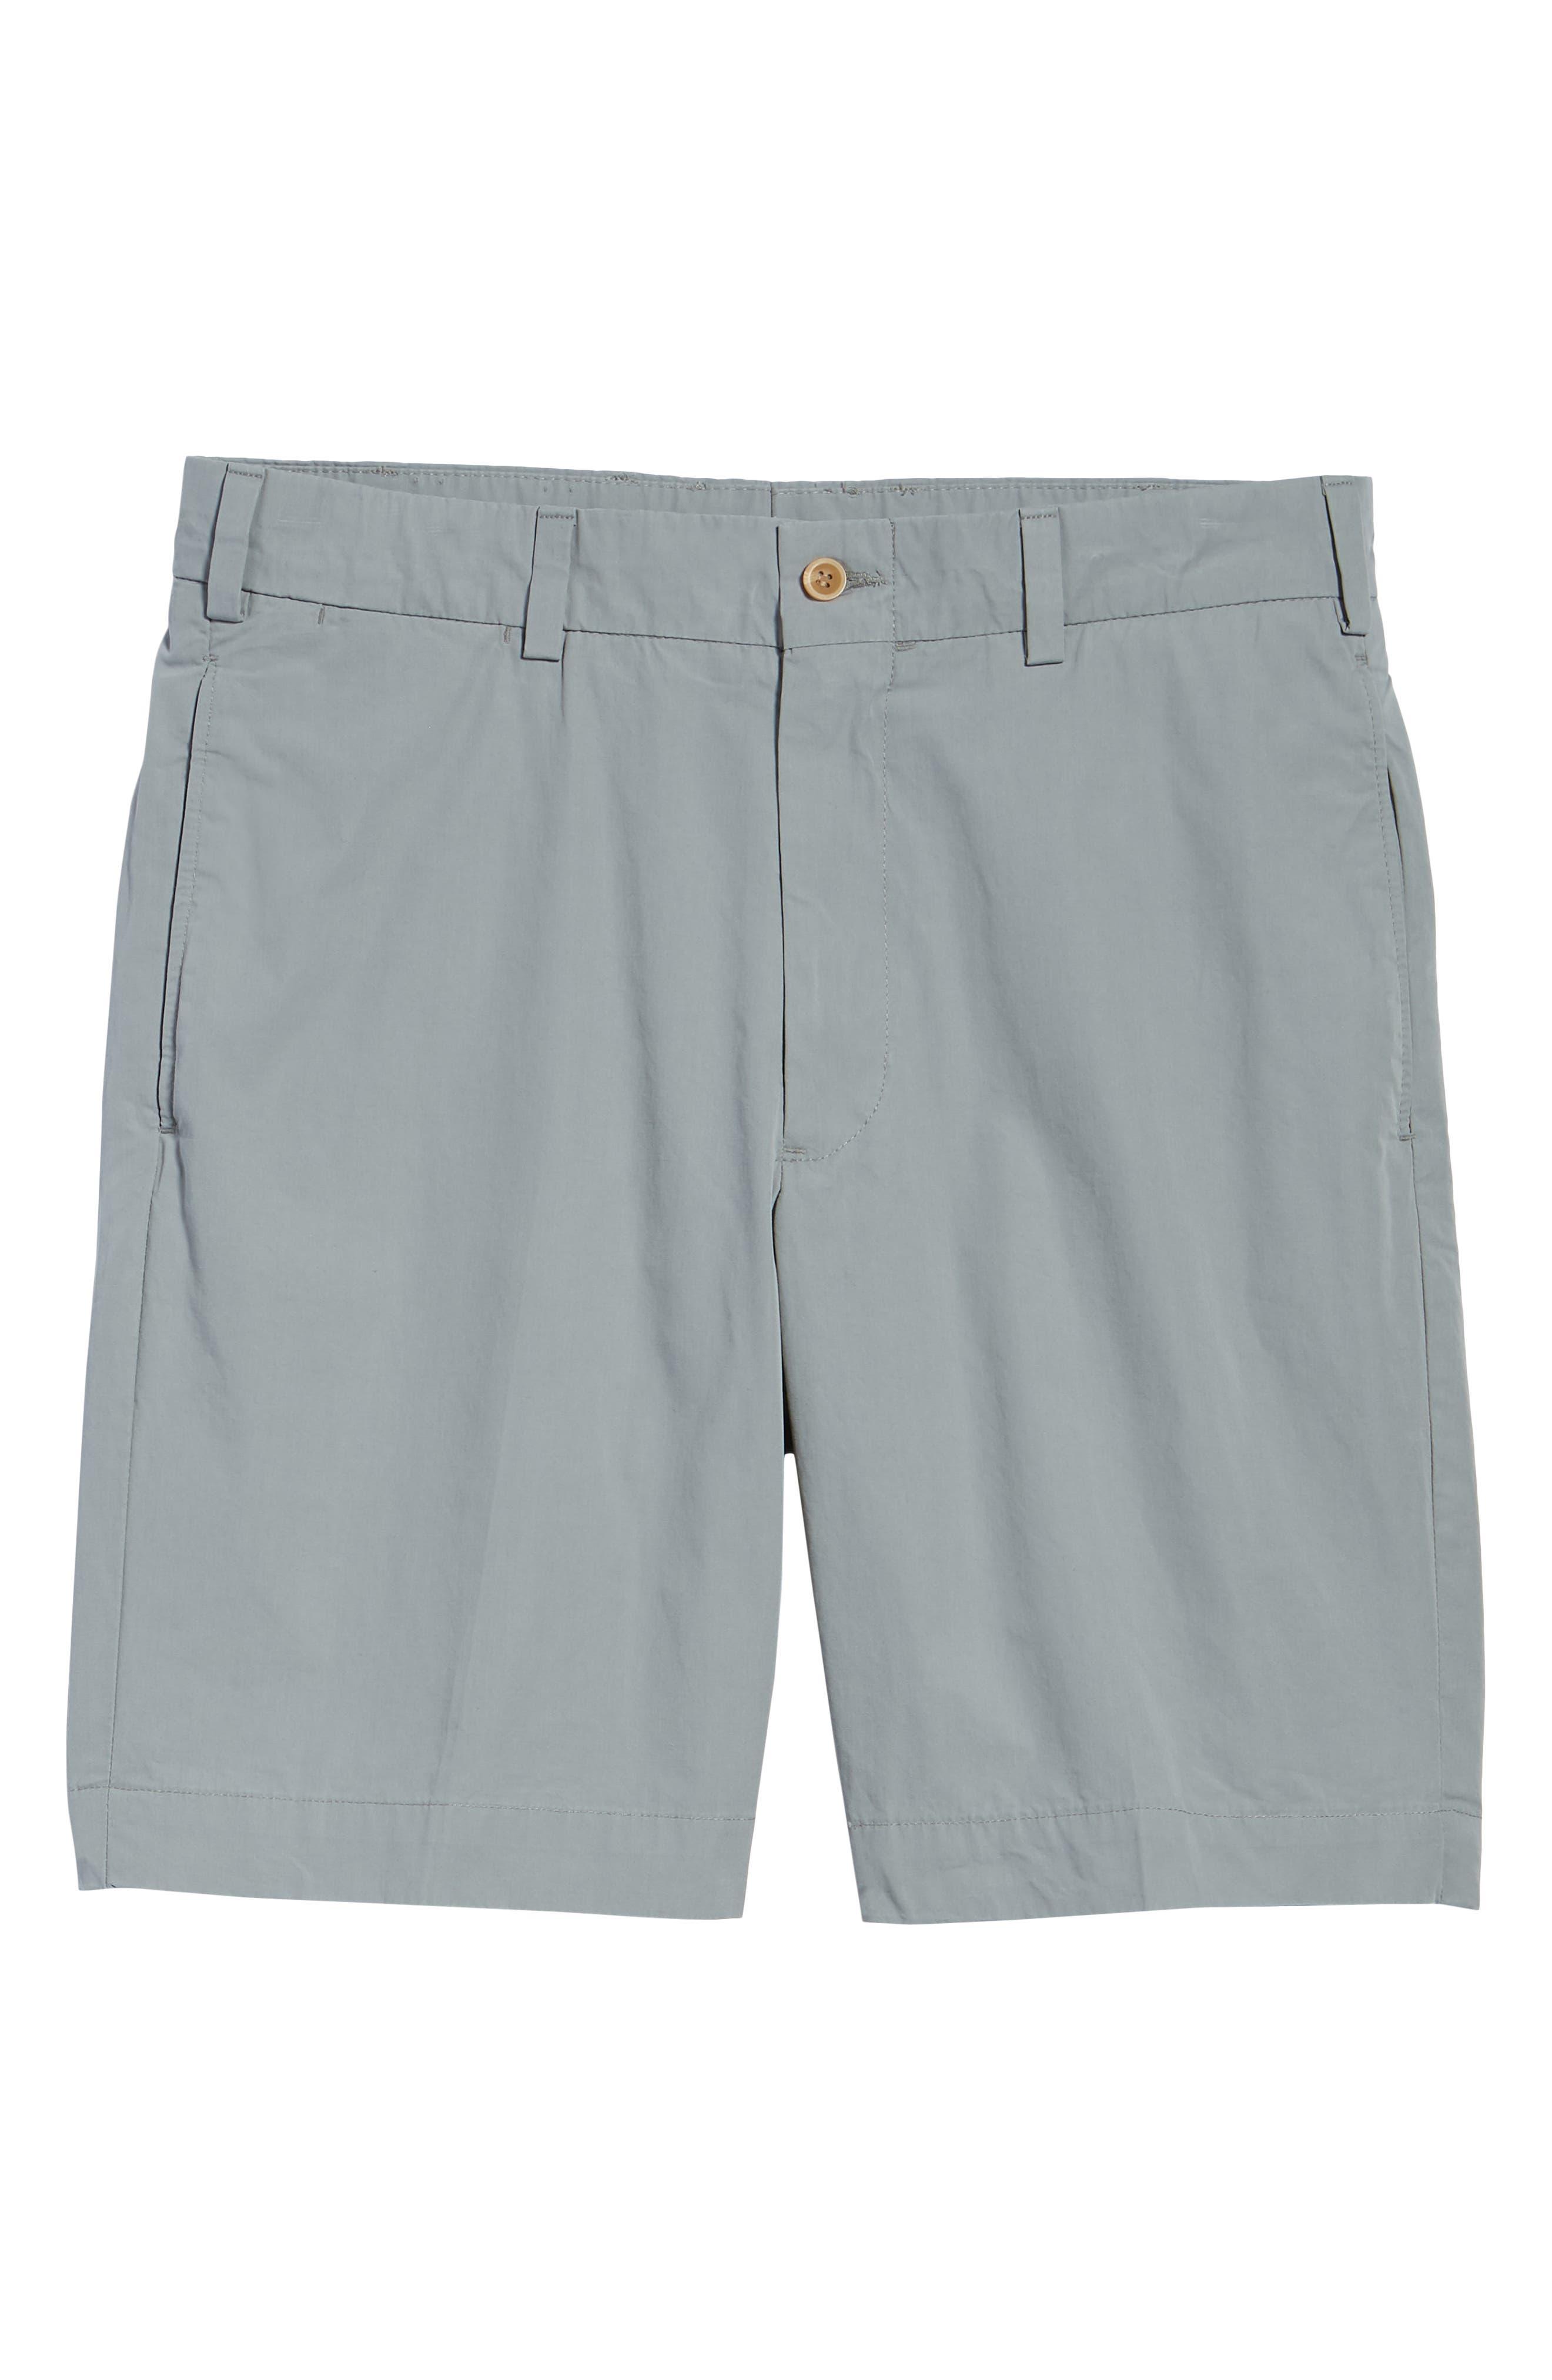 Classic Fit Tropical Poplin Shorts,                             Alternate thumbnail 6, color,                             NICKEL